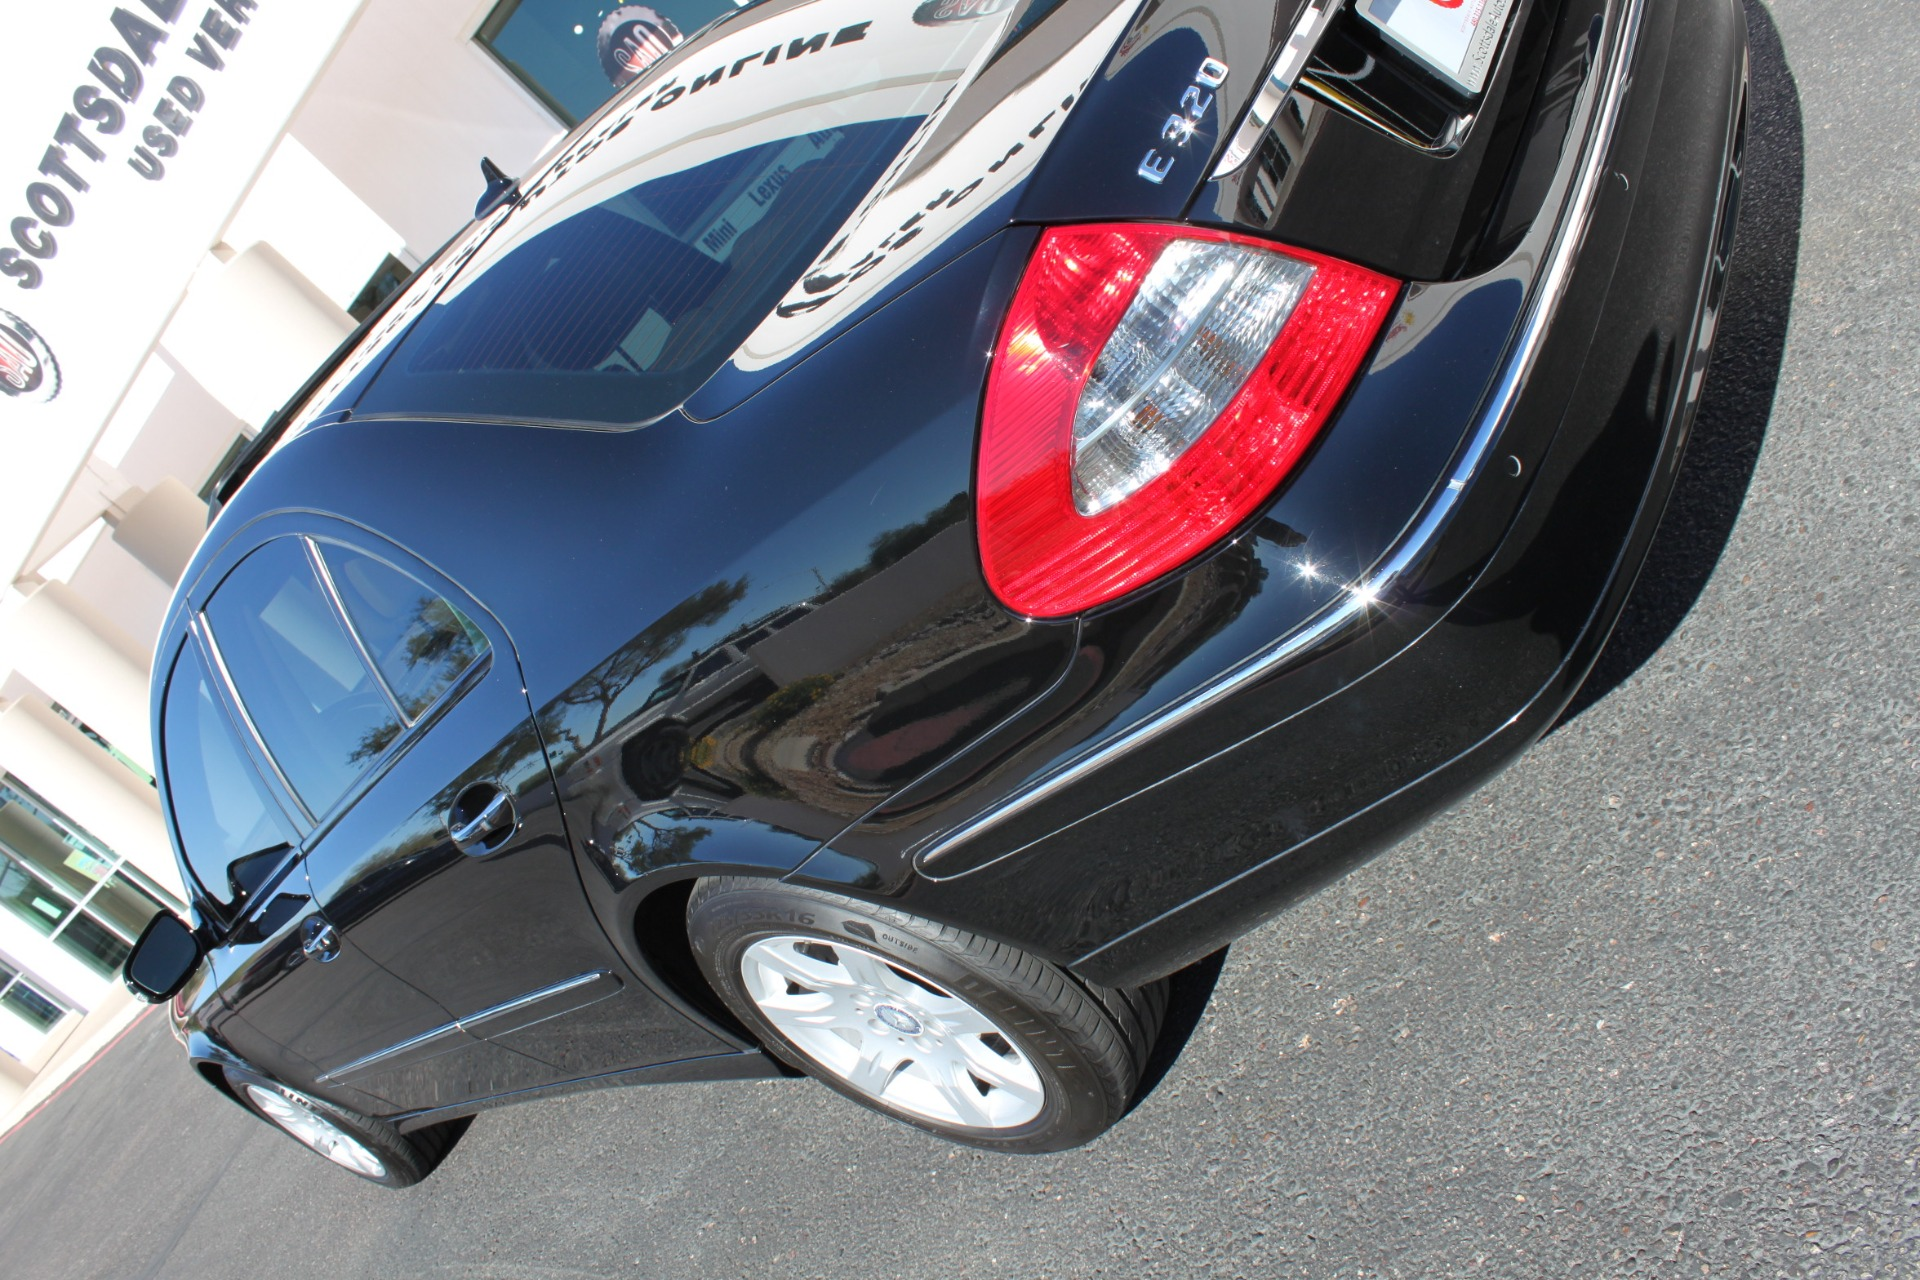 Used-2009-Mercedes-Benz-E-Class-E320-30L-BlueTEC-4X4